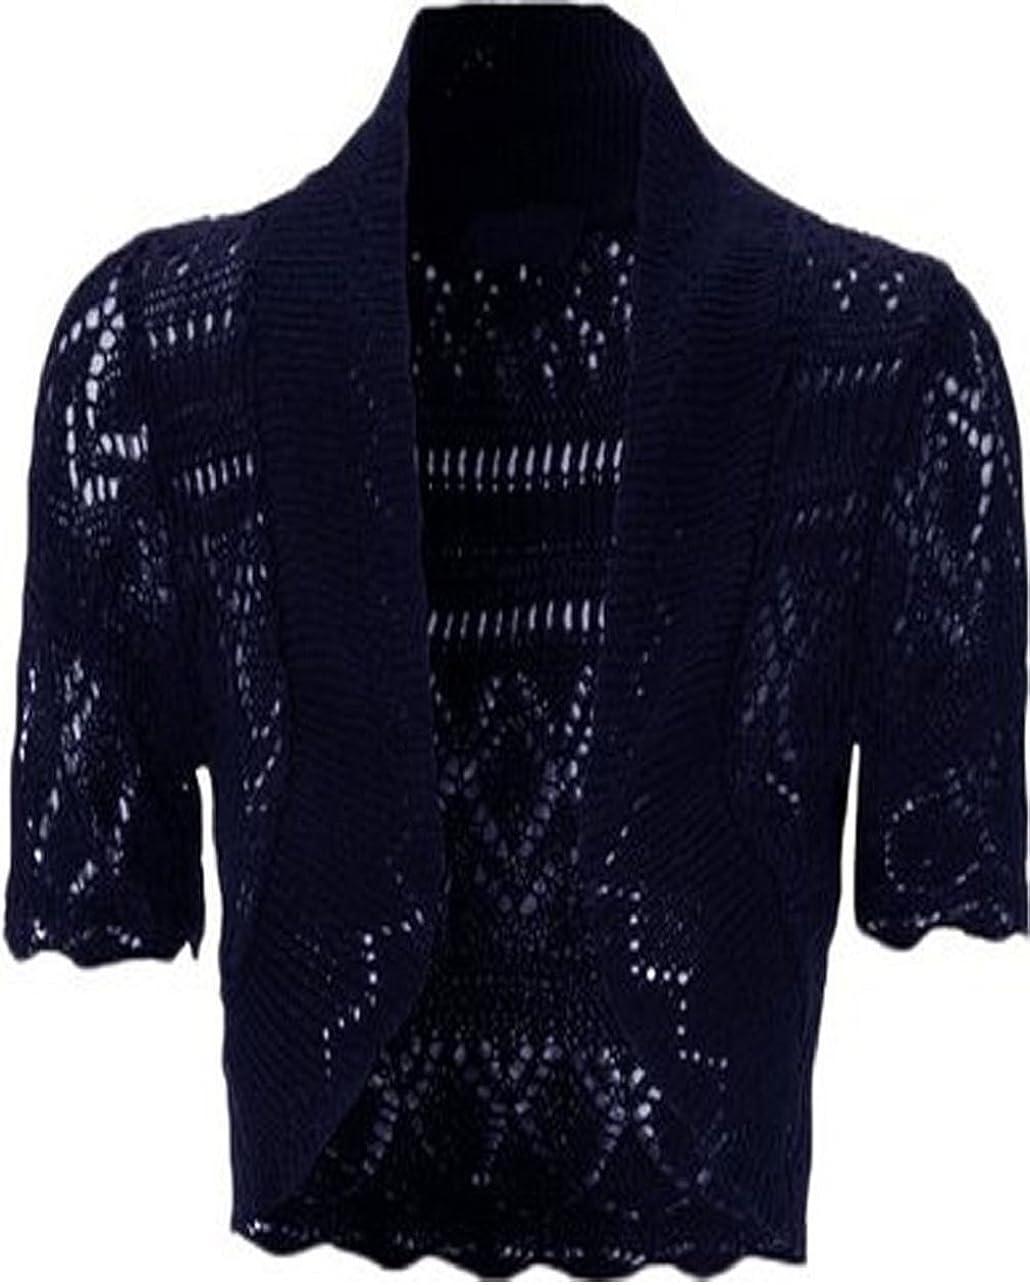 Womens Knitted Bolero Shrug Short Sleeve Crochet Shrug (XL, Navy)